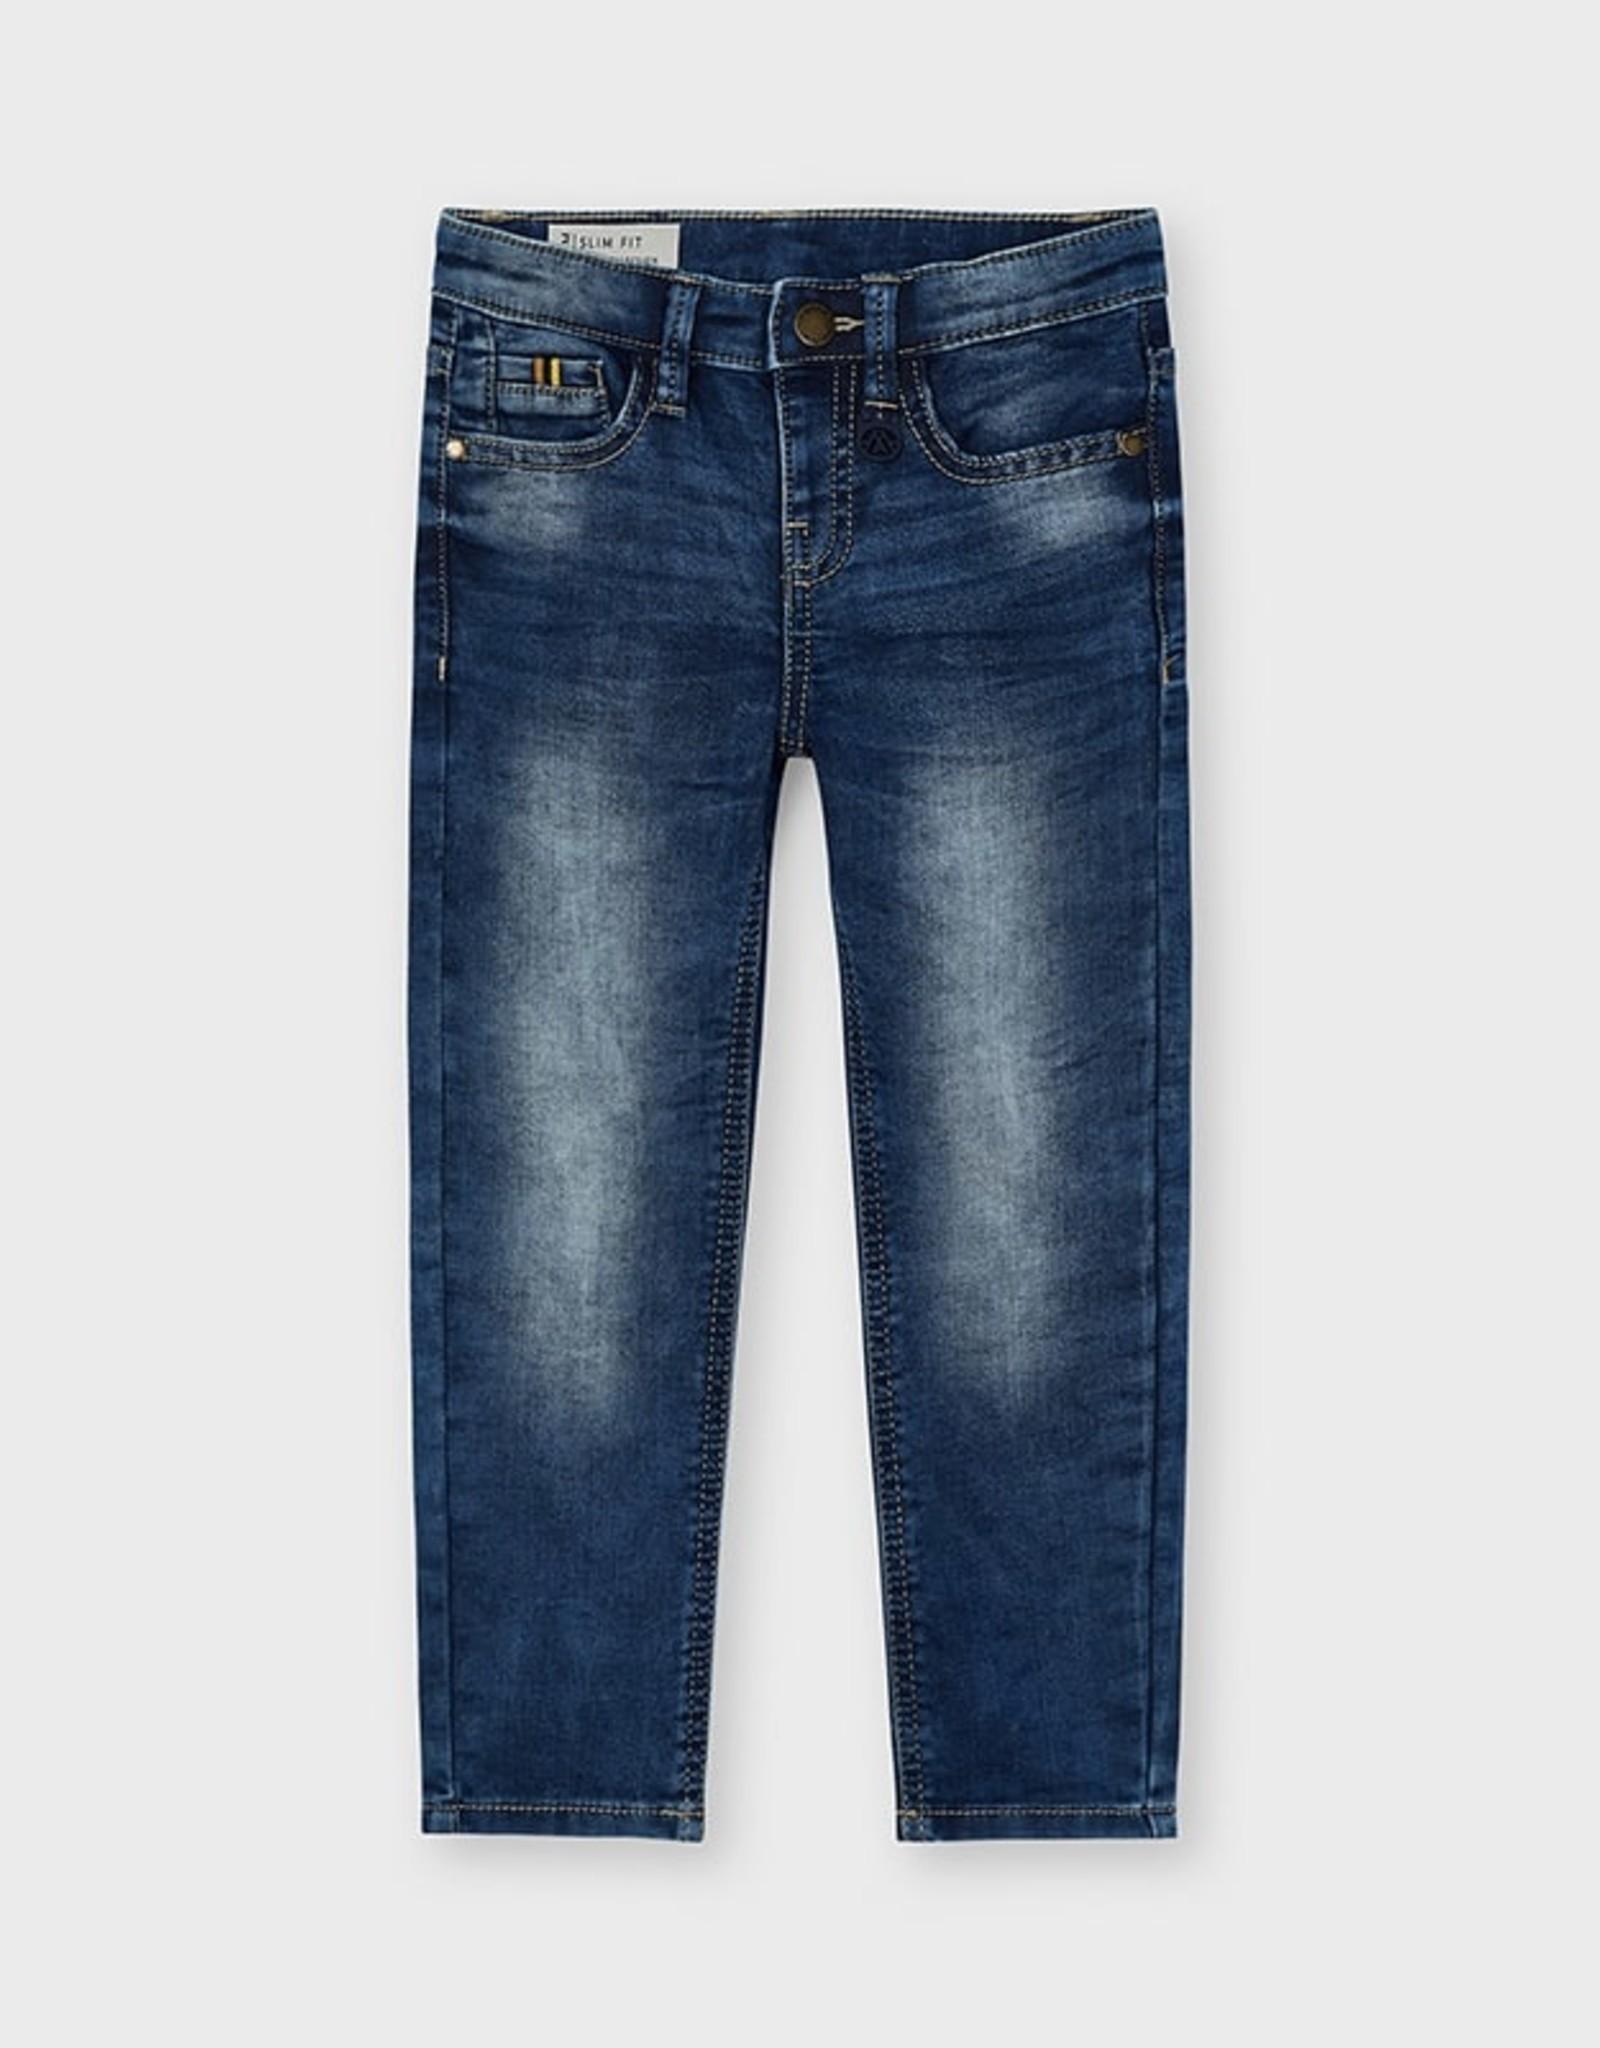 Mayoral SP21 B Slim Fit Blue Jeans